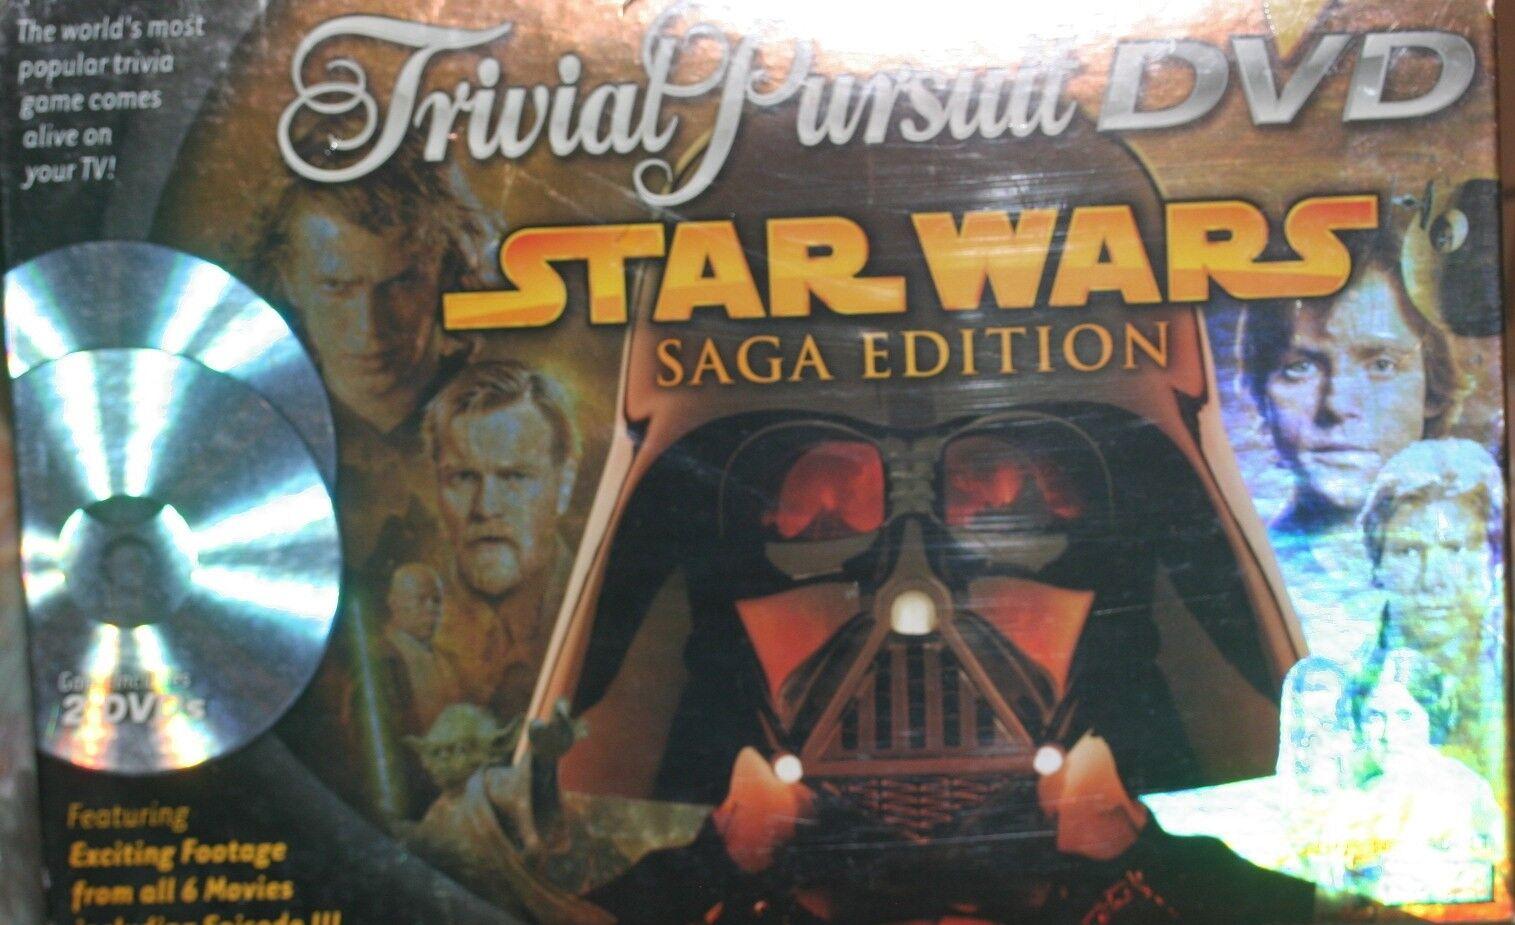 TRIVIAL PURSUIT STAR WARS SAGA EDITION NEW